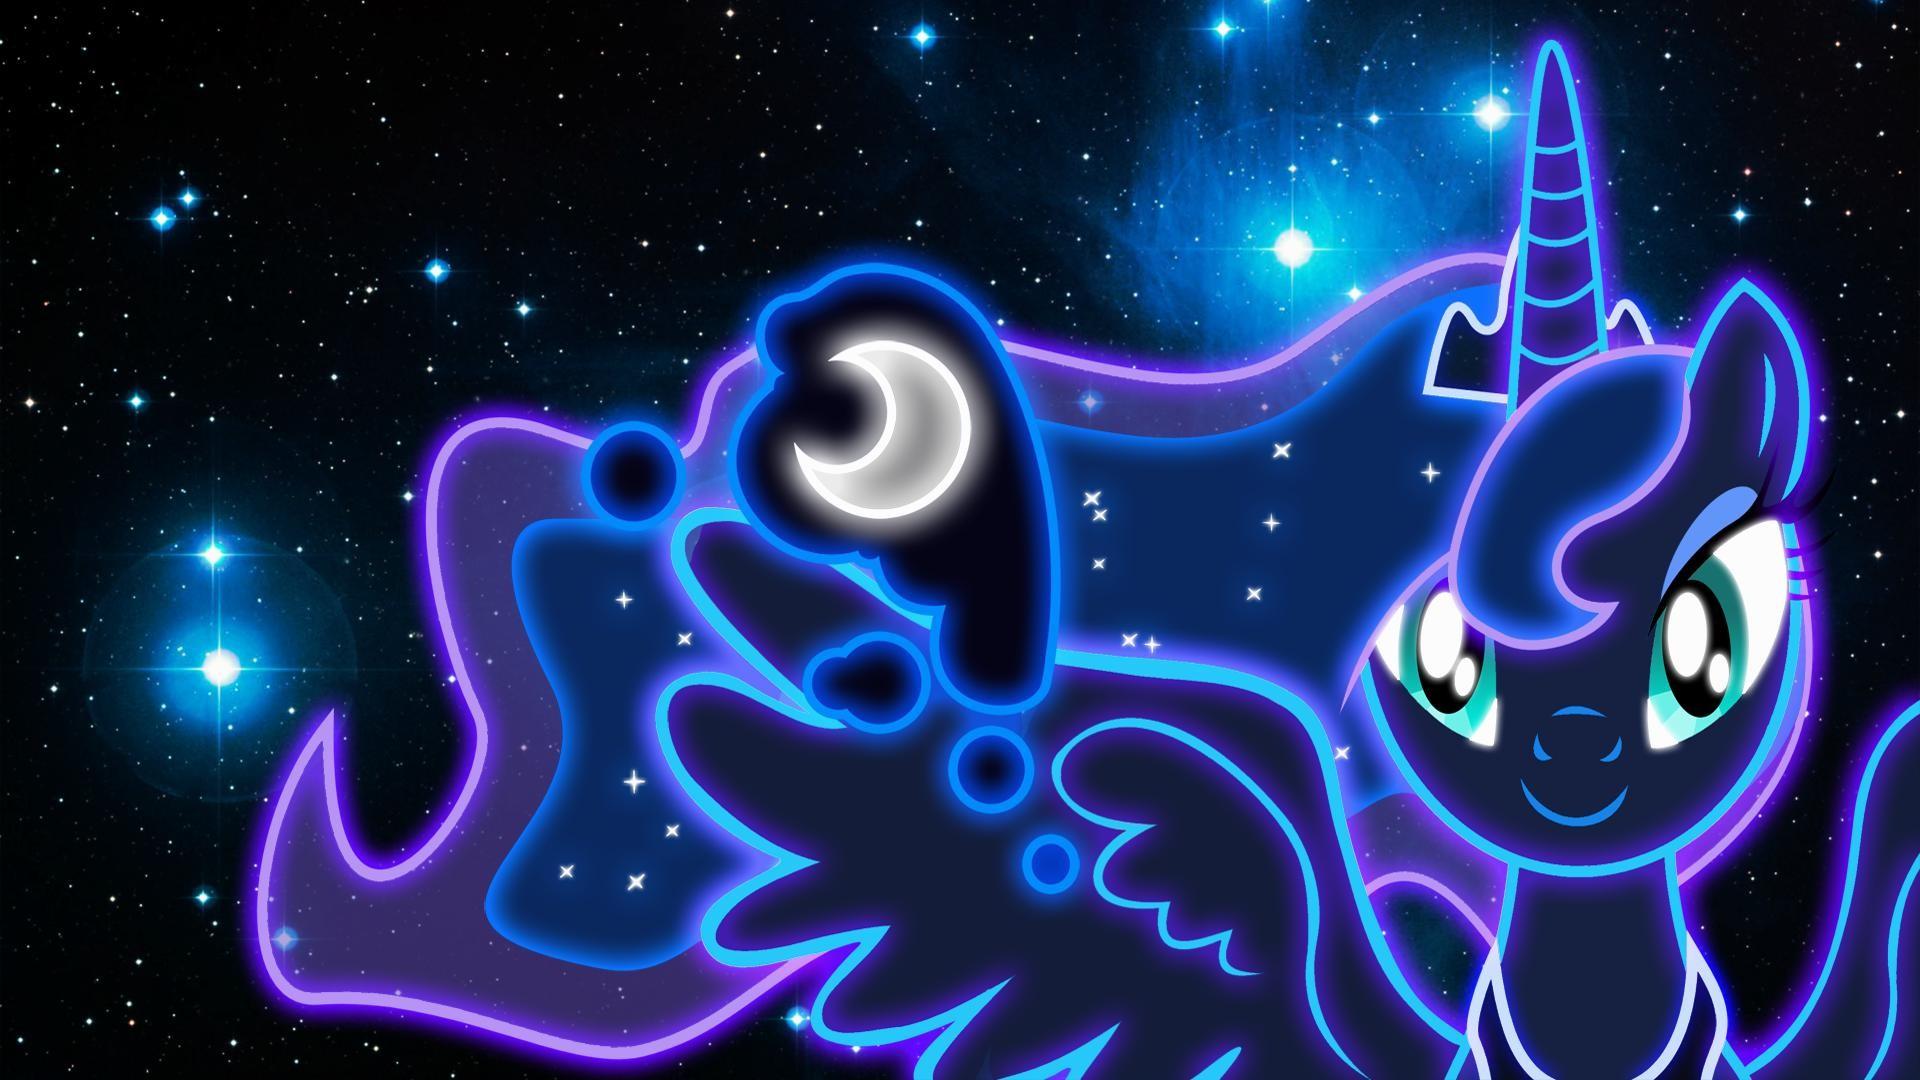 Neon-princess-luna-wallpaper-HD